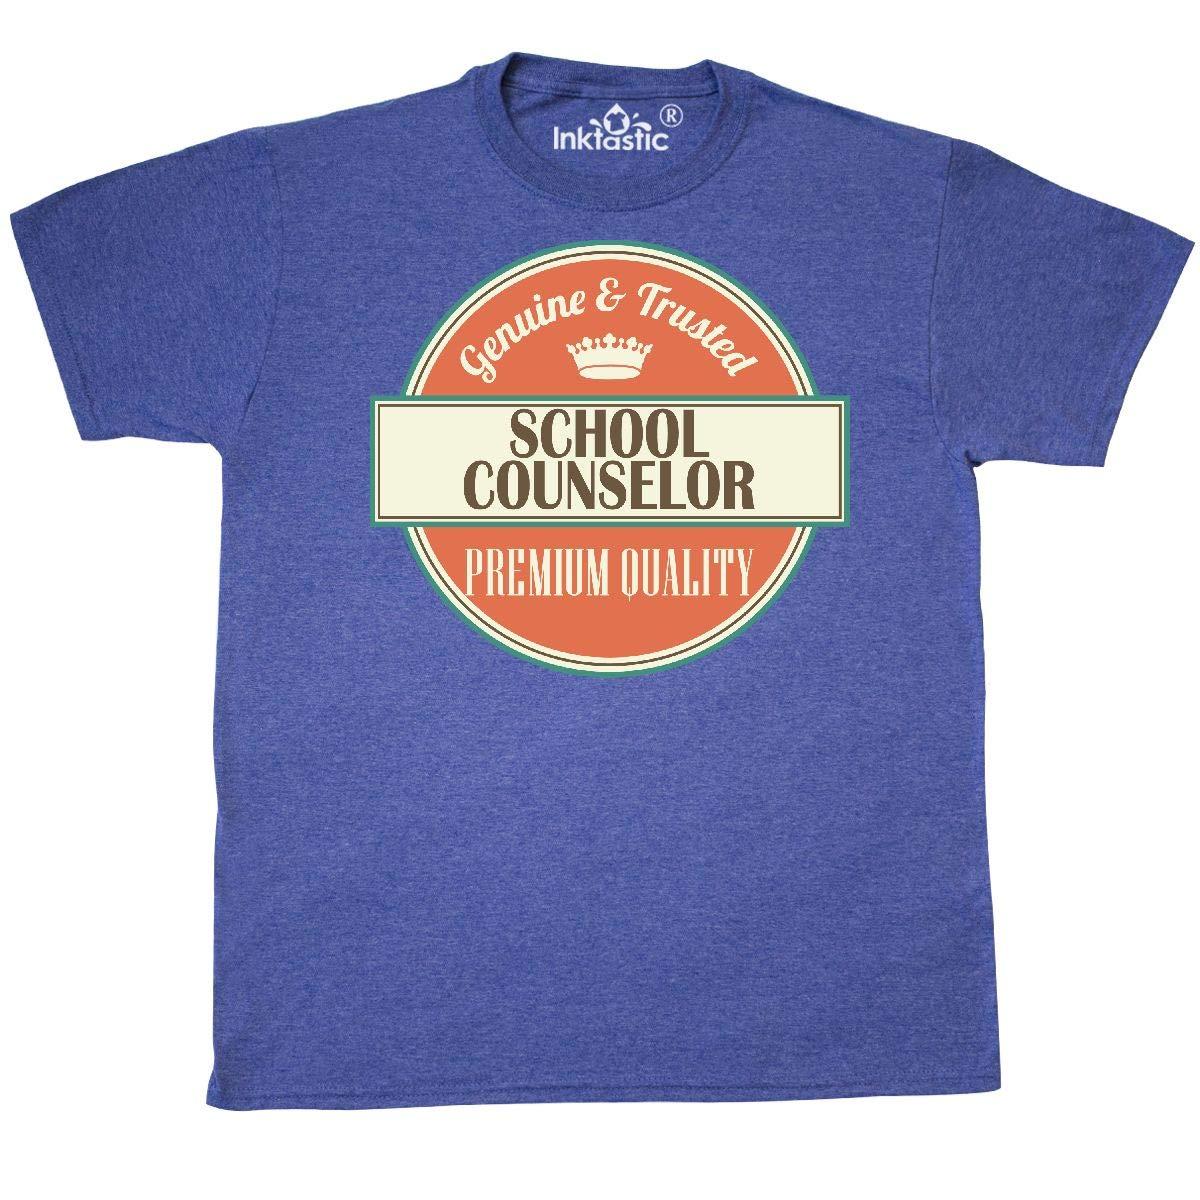 bc3cf91e0 Amazon.com: inktastic - School Counselor Funny Gift Idea T-Shirt 2405a:  Clothing